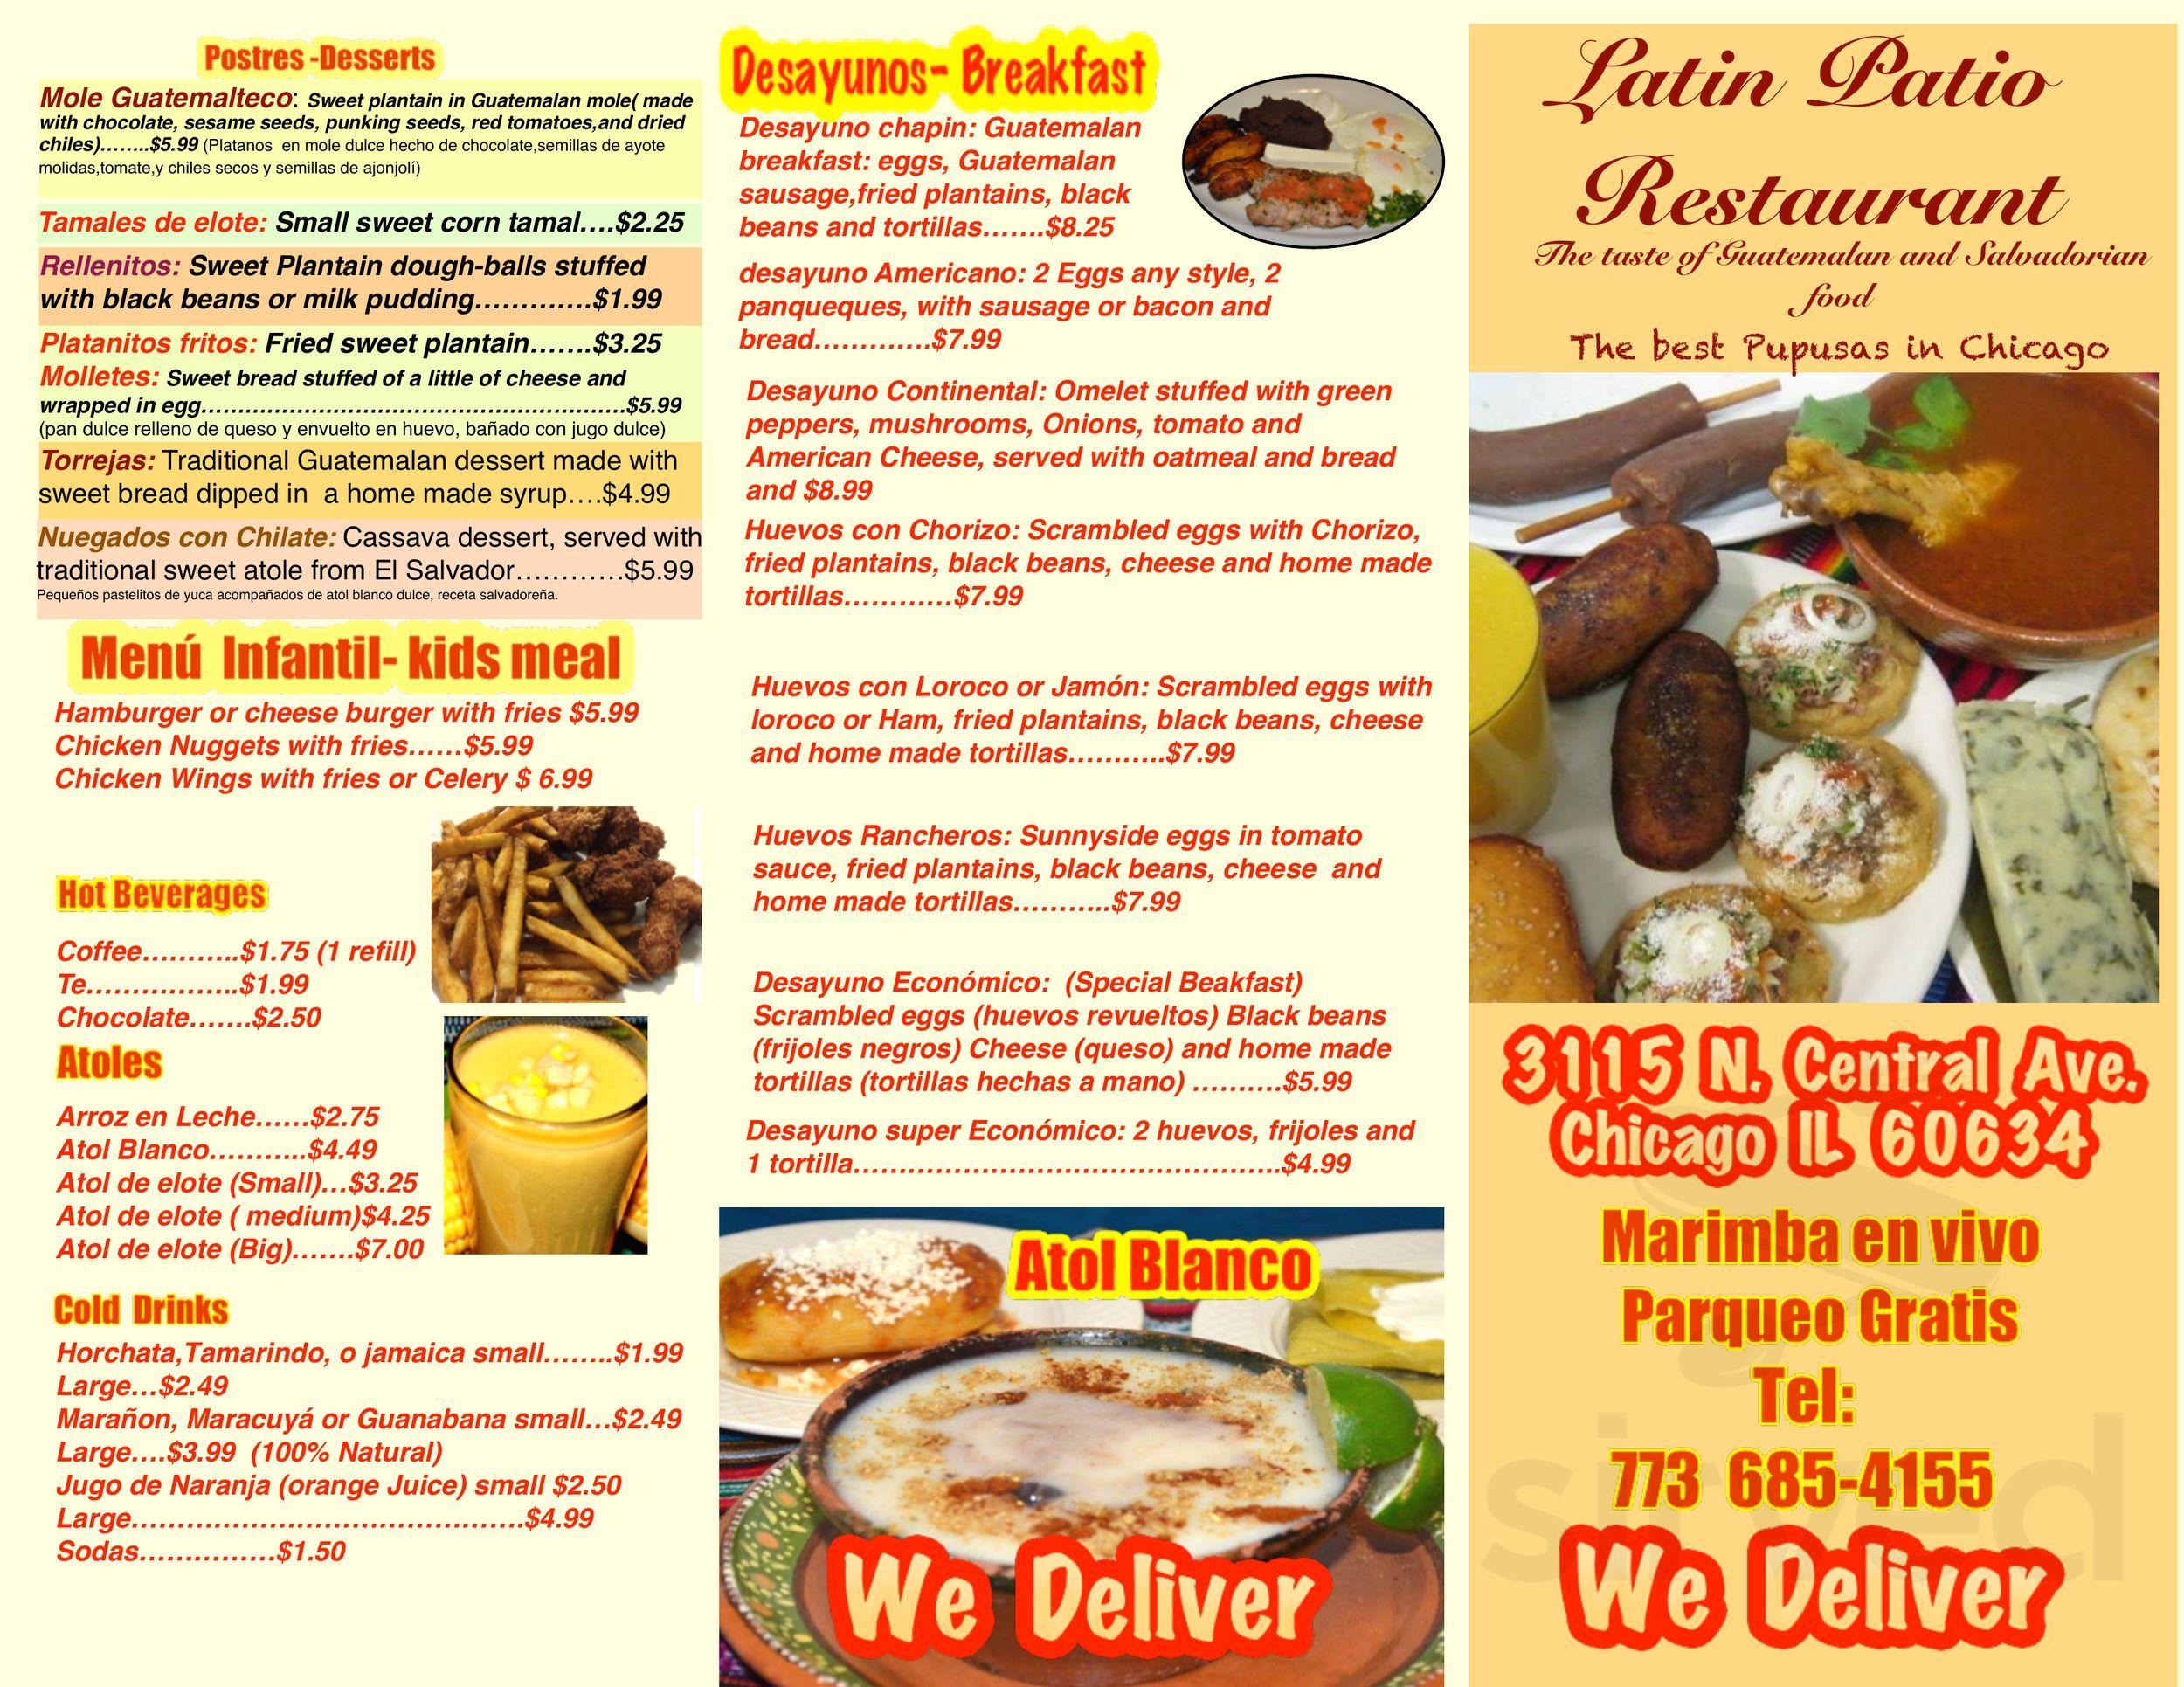 Latin Patio Restaurant Menu In Chicago Illinois Usa